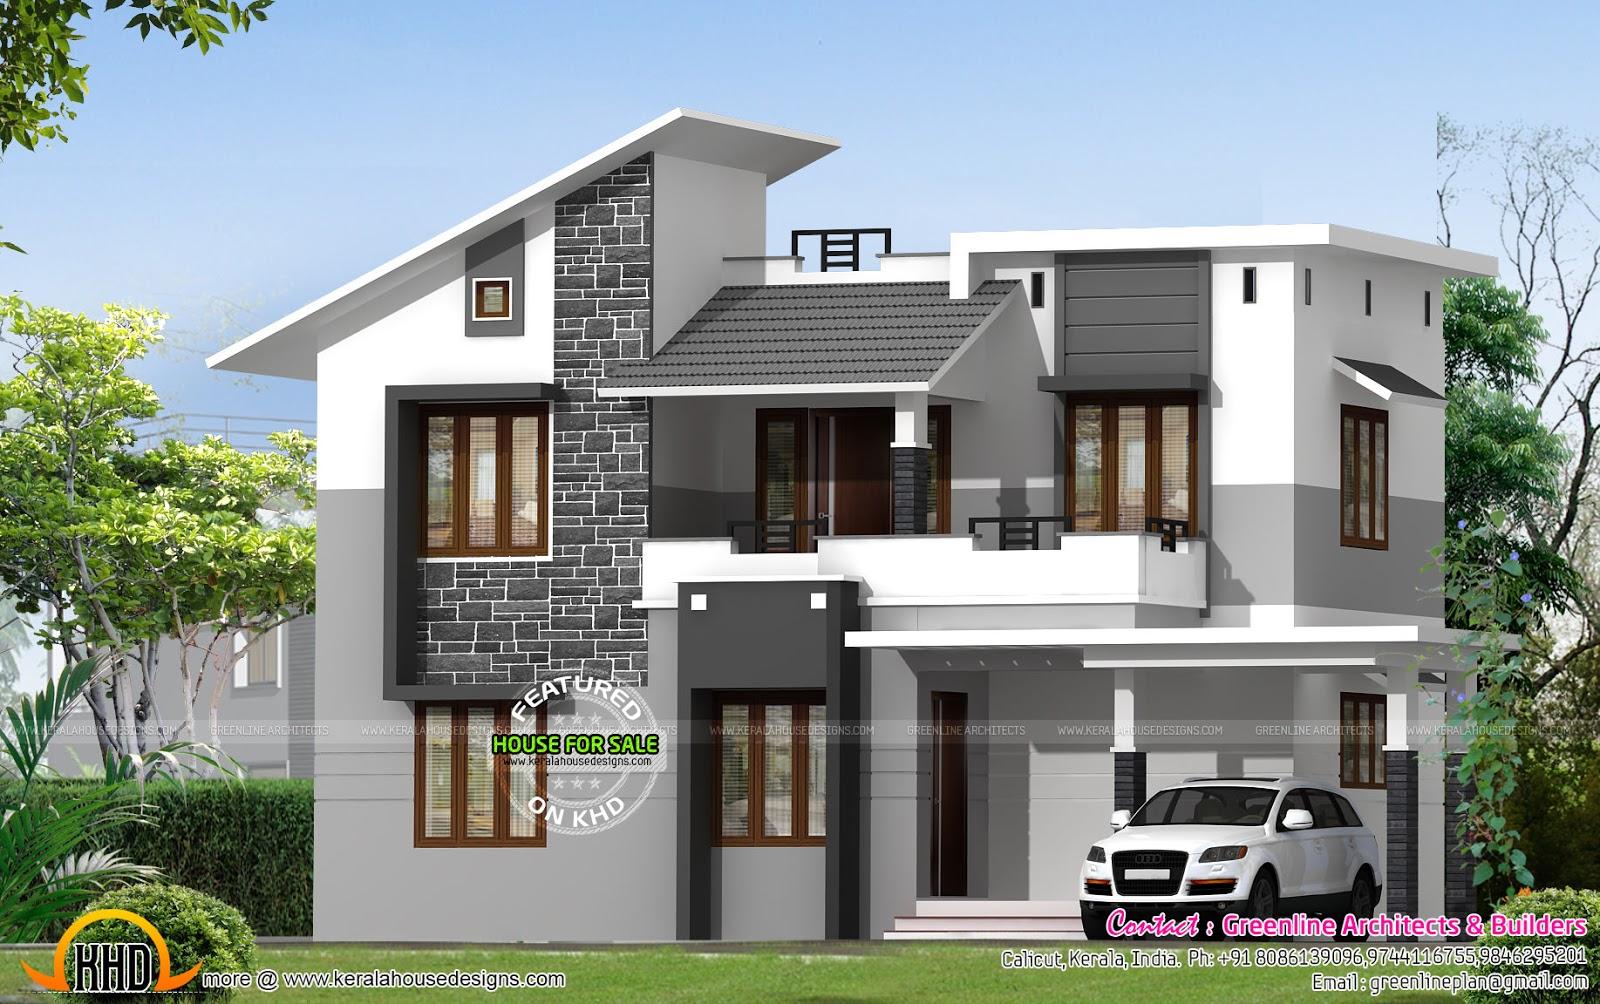 Contemporary compound wall gate designs